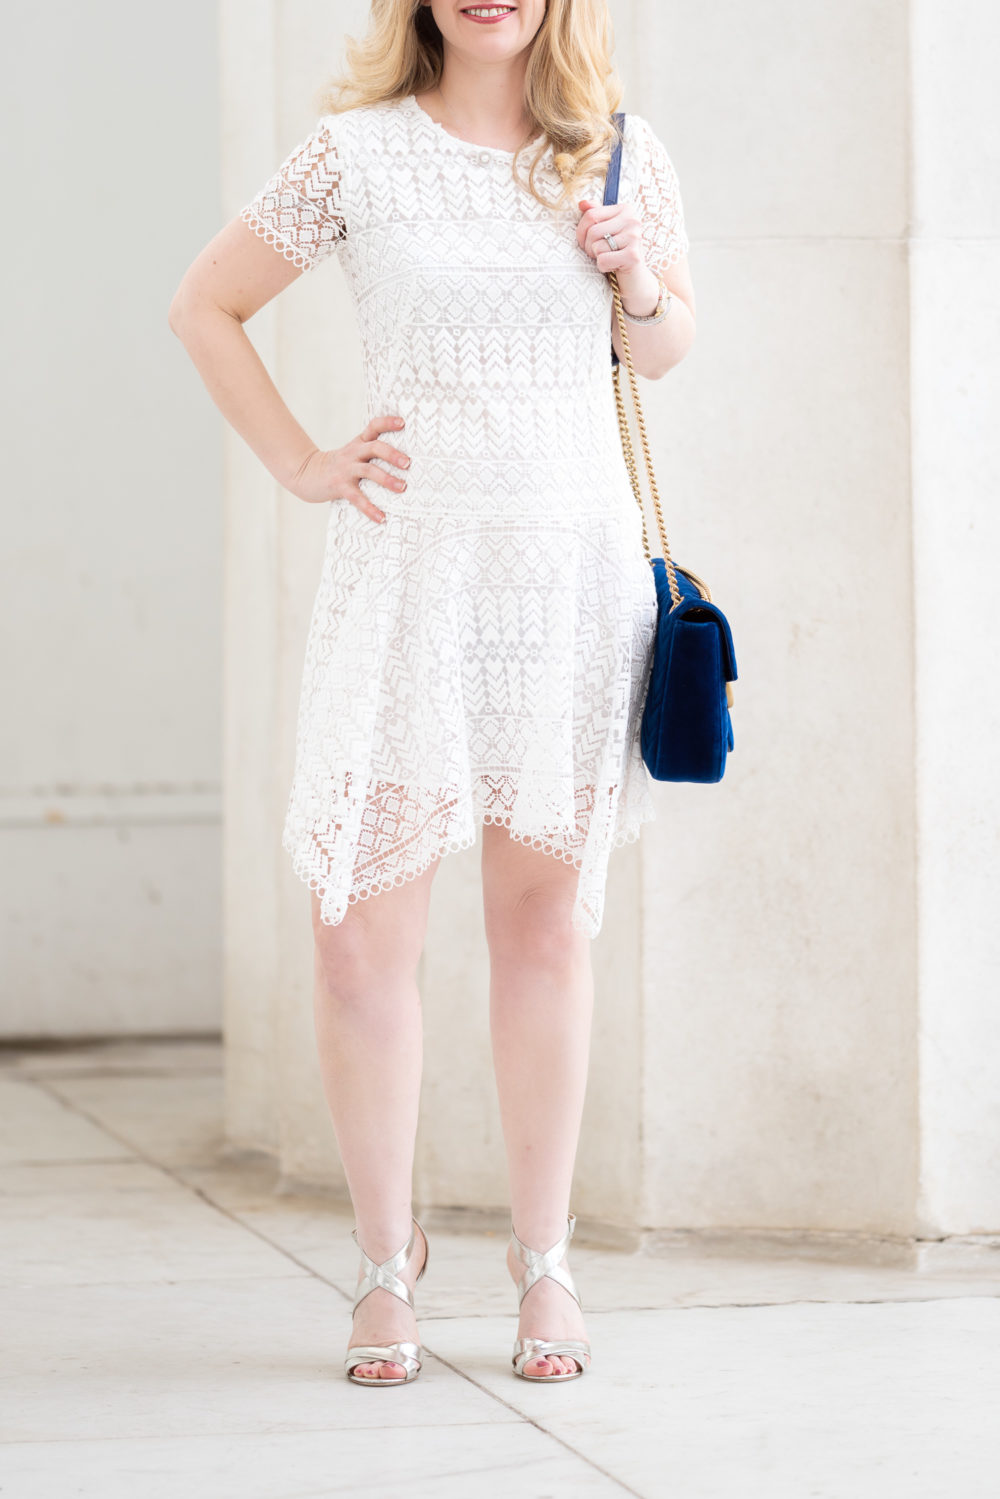 Petite Fashion Blog | Gucci Marmont Velvet Bag | Designer Bags on eBay | Anthropologie Anika Lace Dress | Jimmy Choo Sandals | Michele Deco Diamond Watch | David Yurman Bracelet